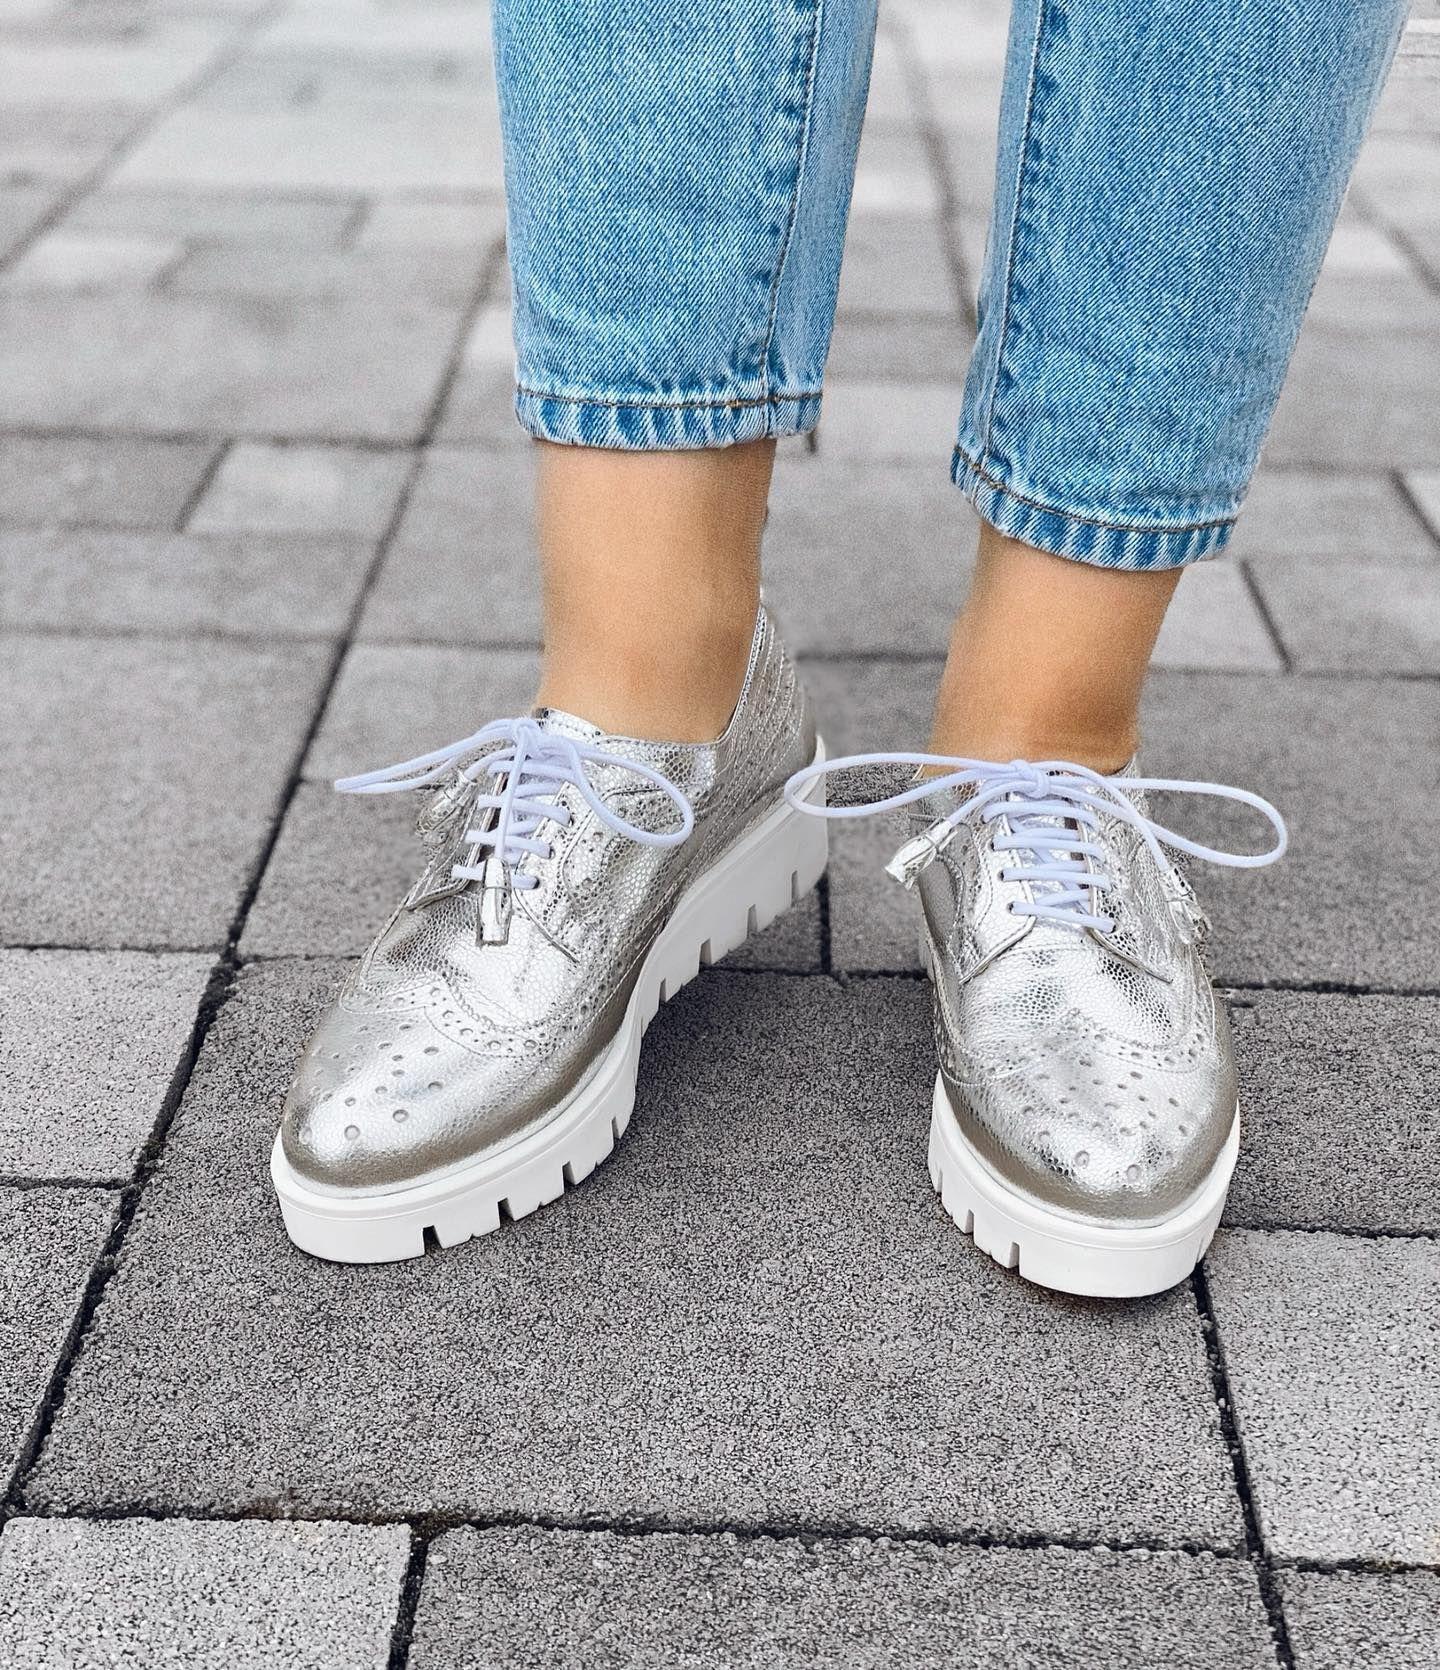 Silver shoes 💓 handmade leather lovidovi